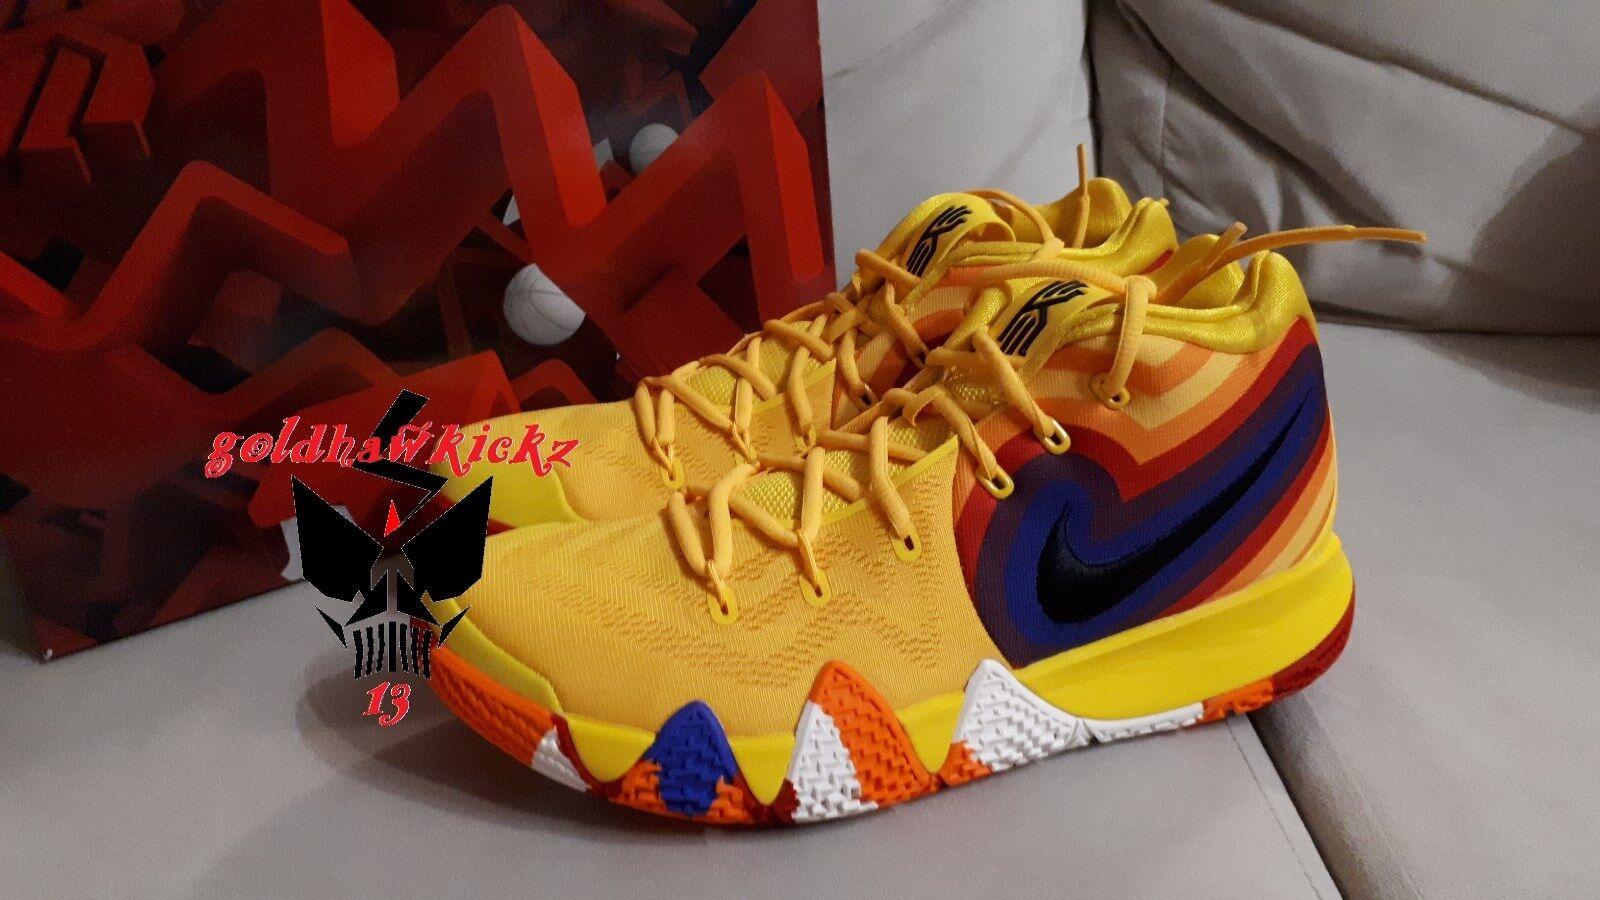 Nike kyrie 4 70s 943806 700 amarillo yellow celtics Multicolor MC decade pack